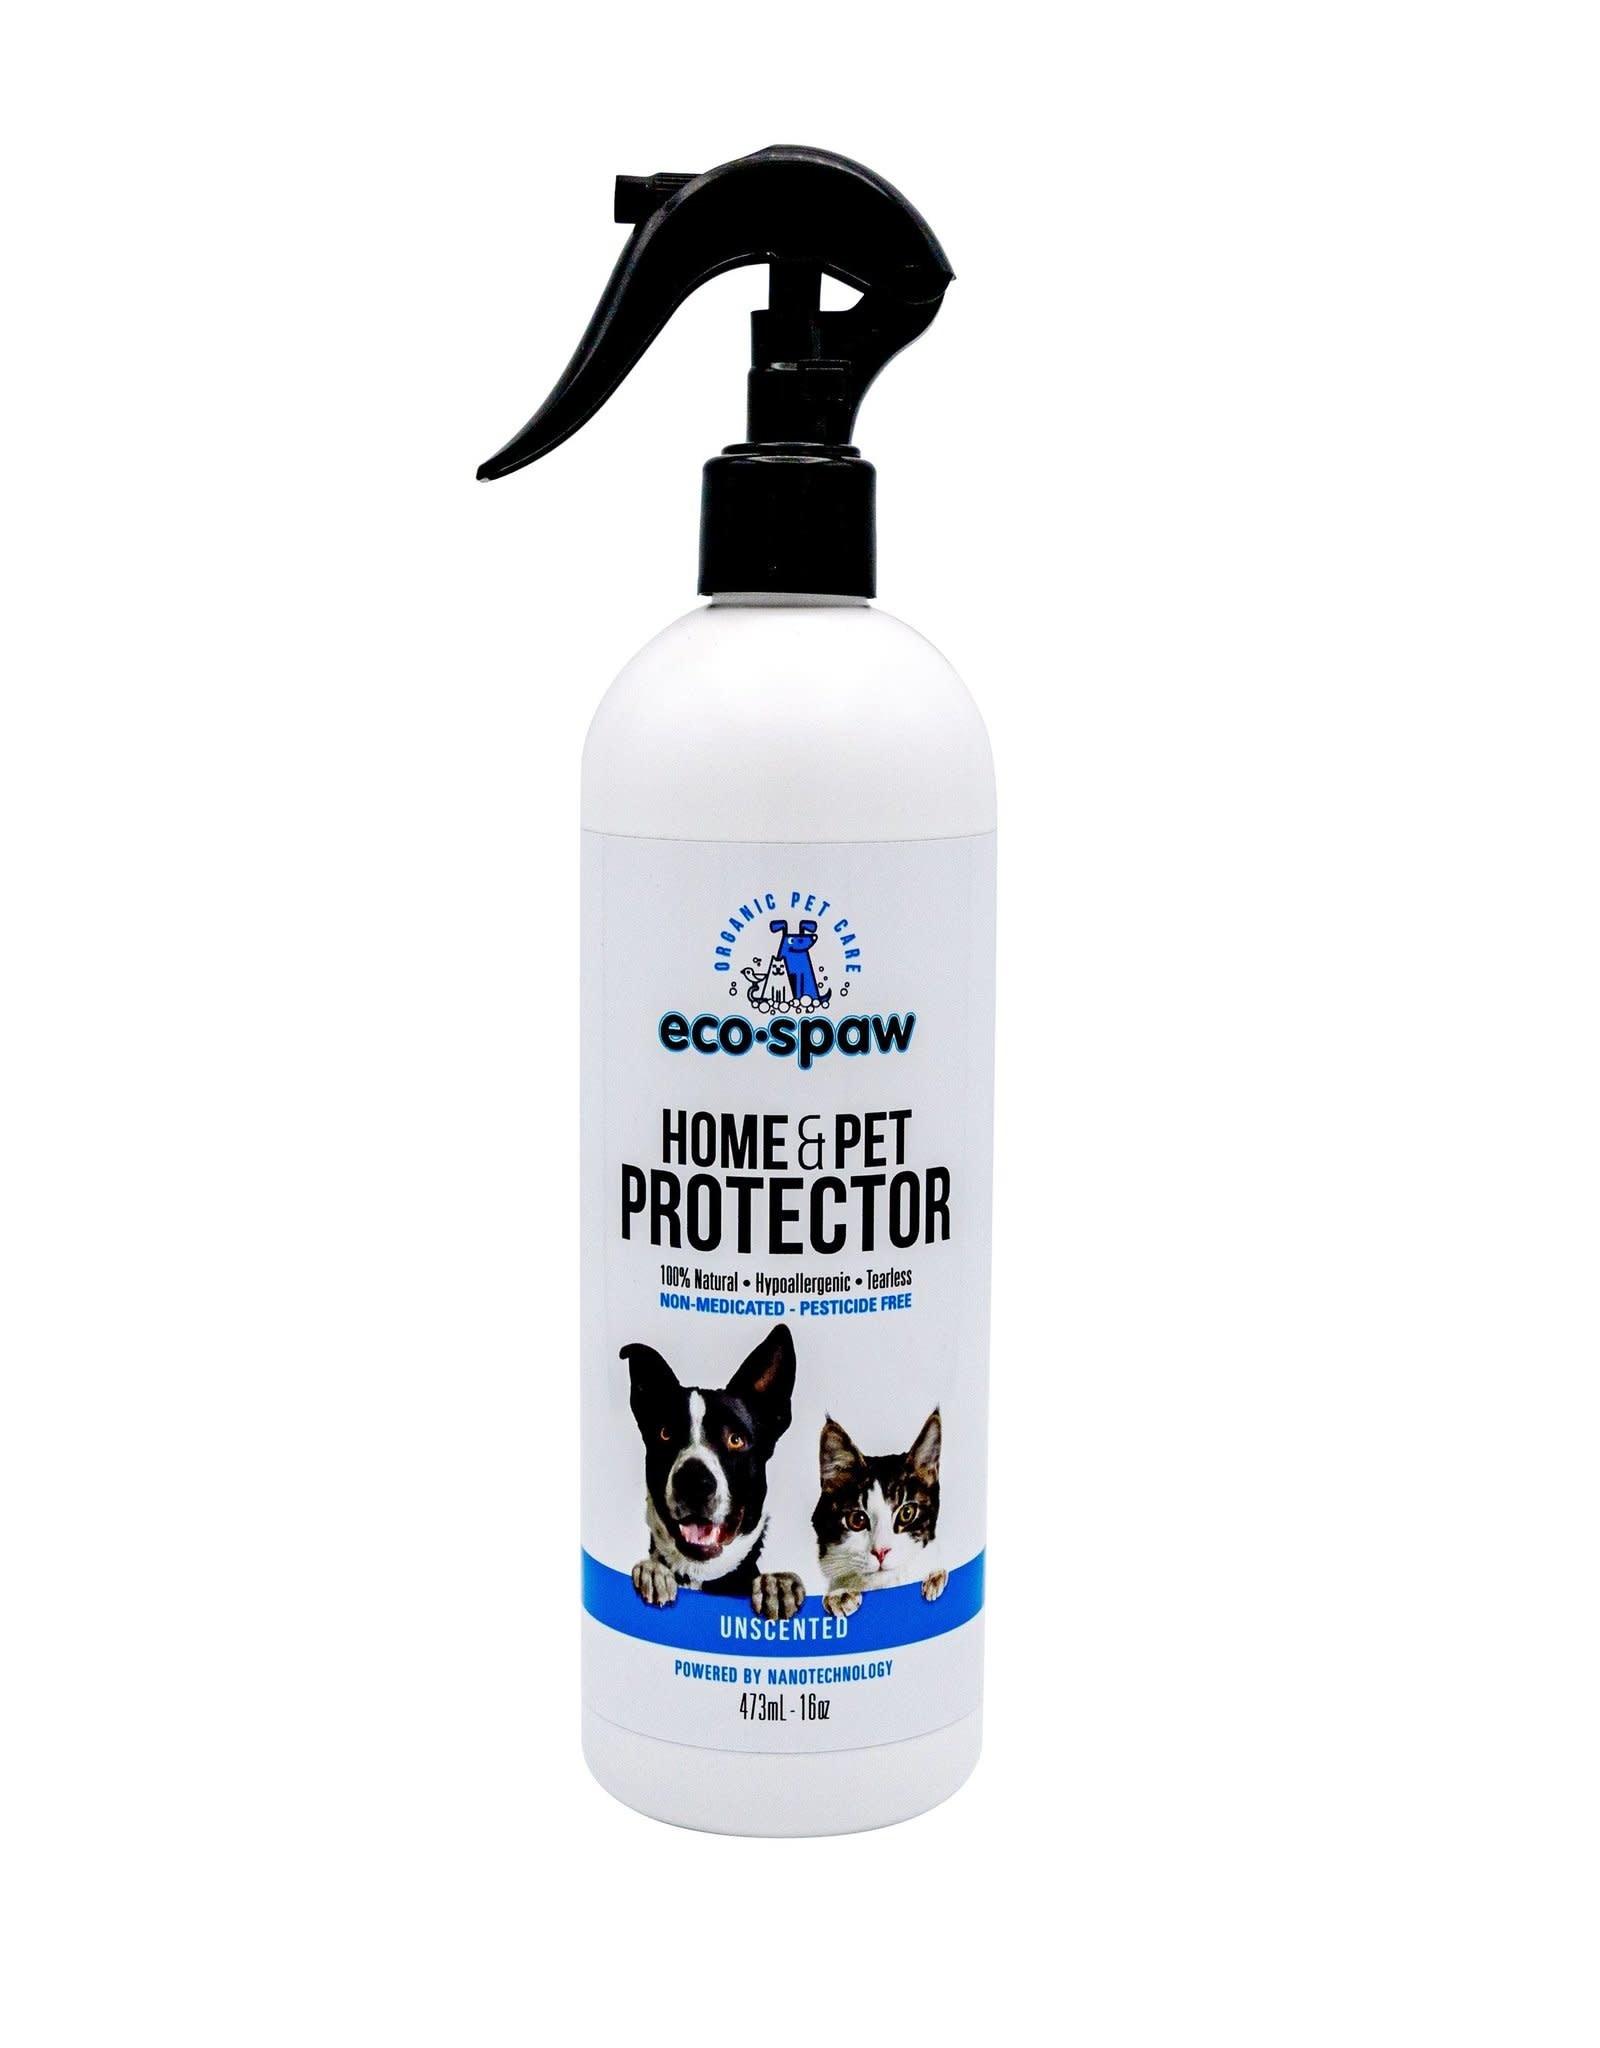 Eco Spaw Eco Spaw Home and Pet Protector 16 oz